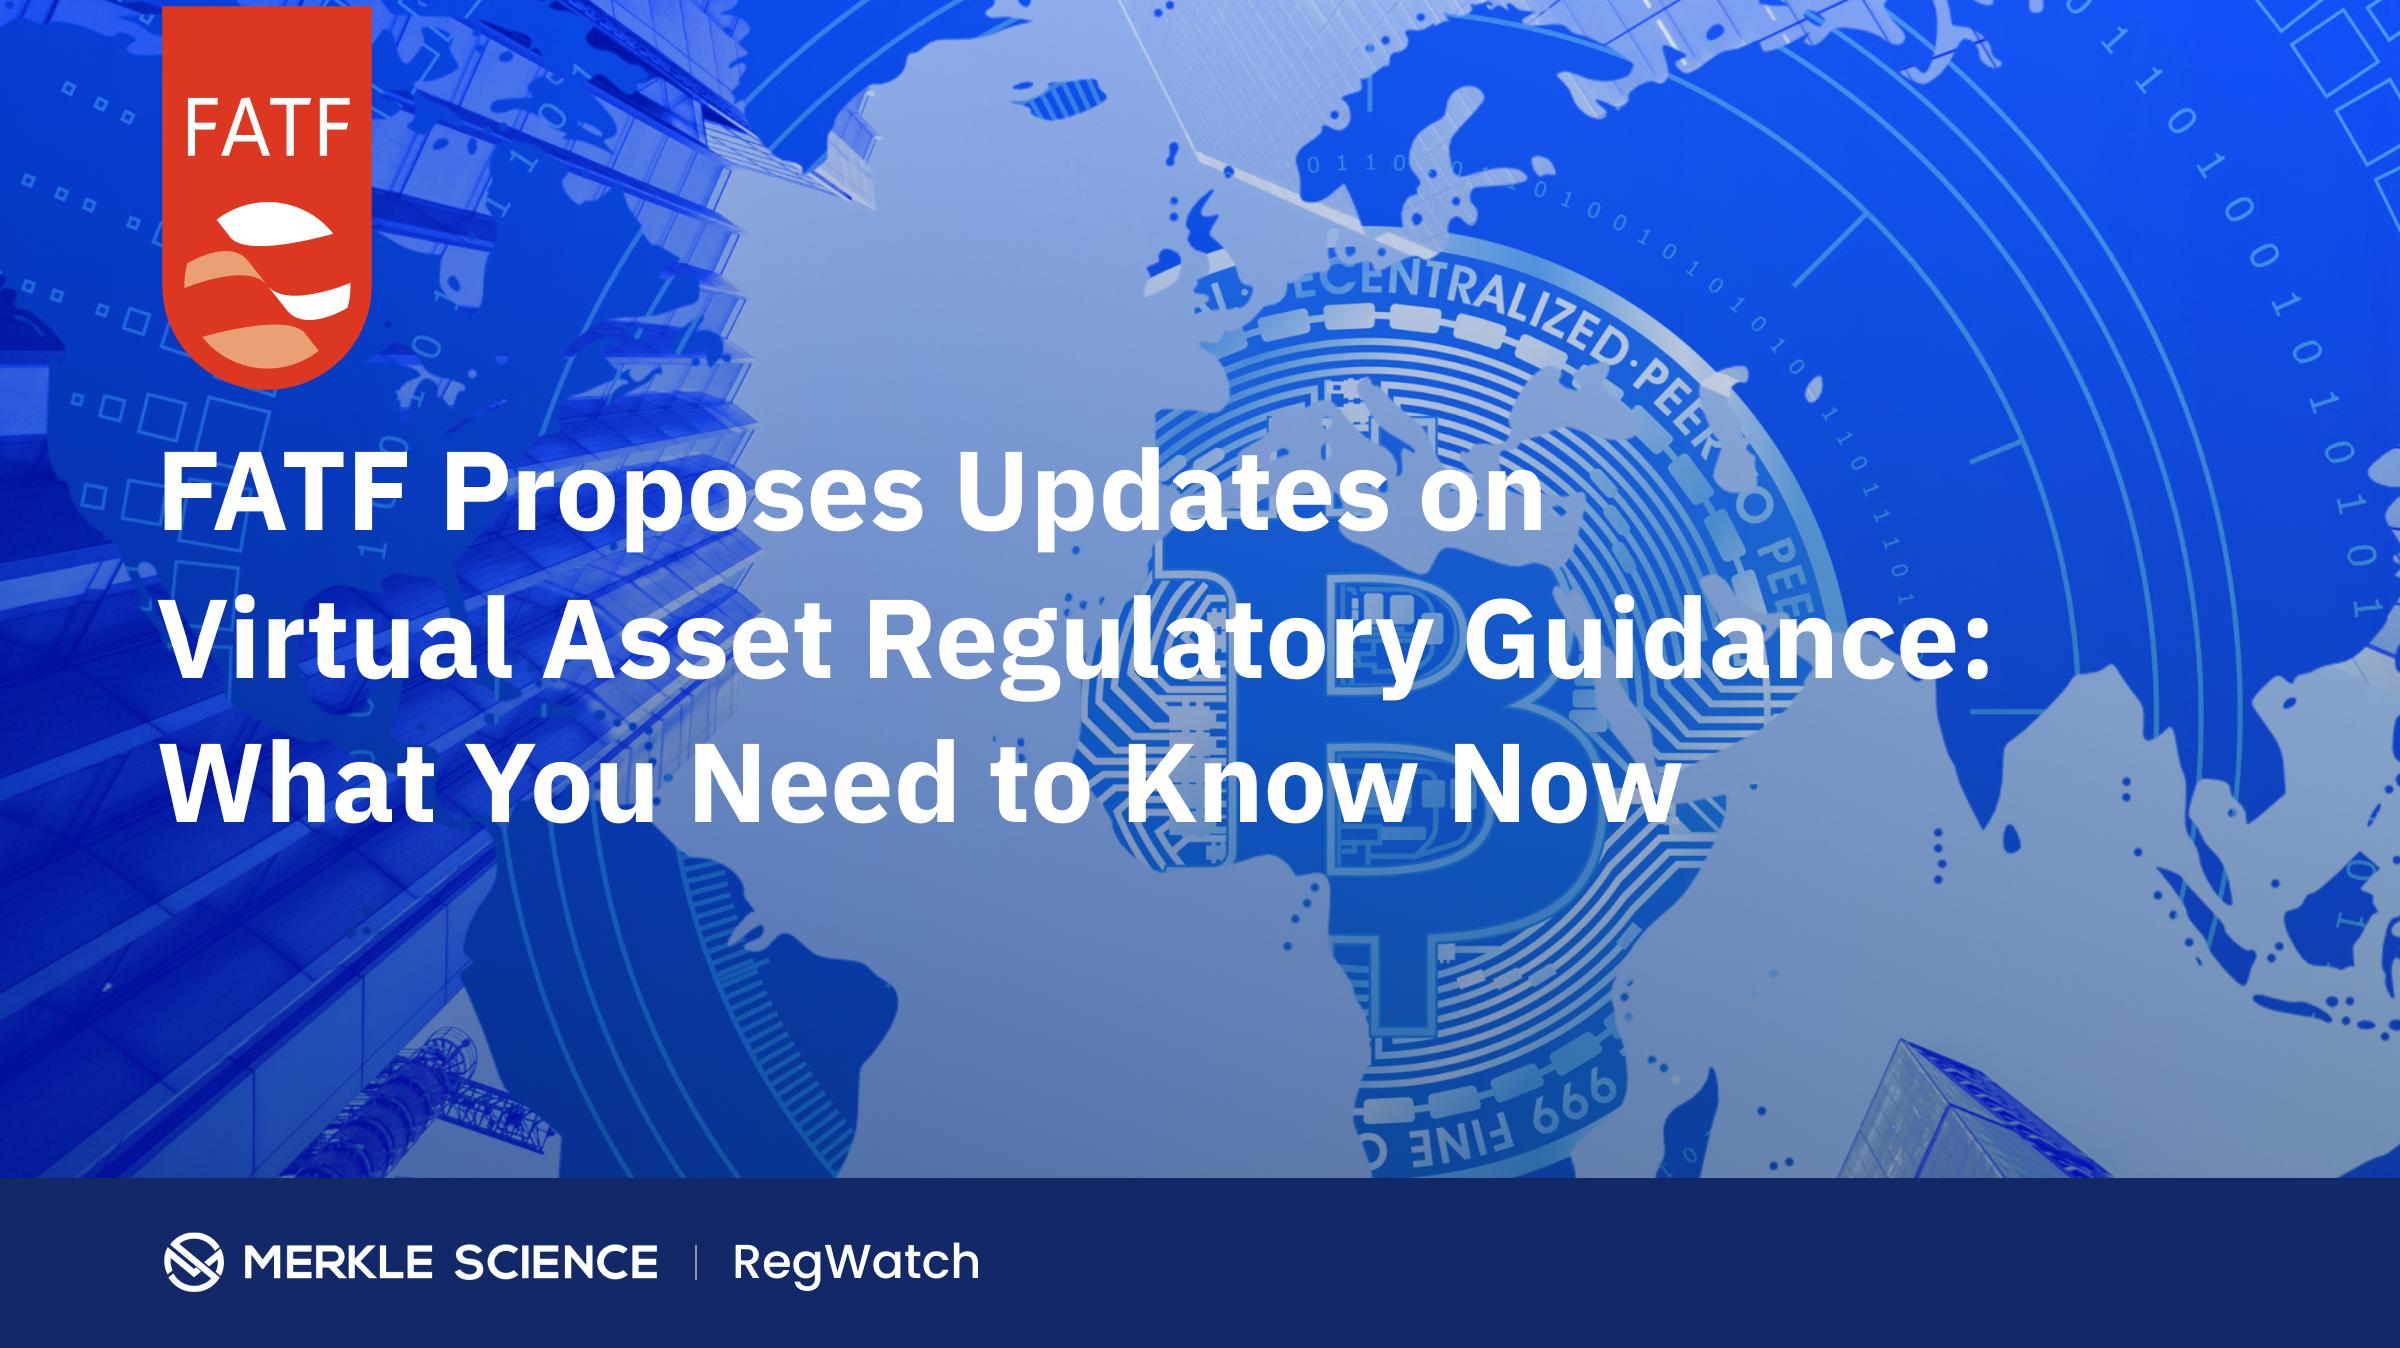 FATF Proposes Updates on Virtual Asset Regulatory Guidance: